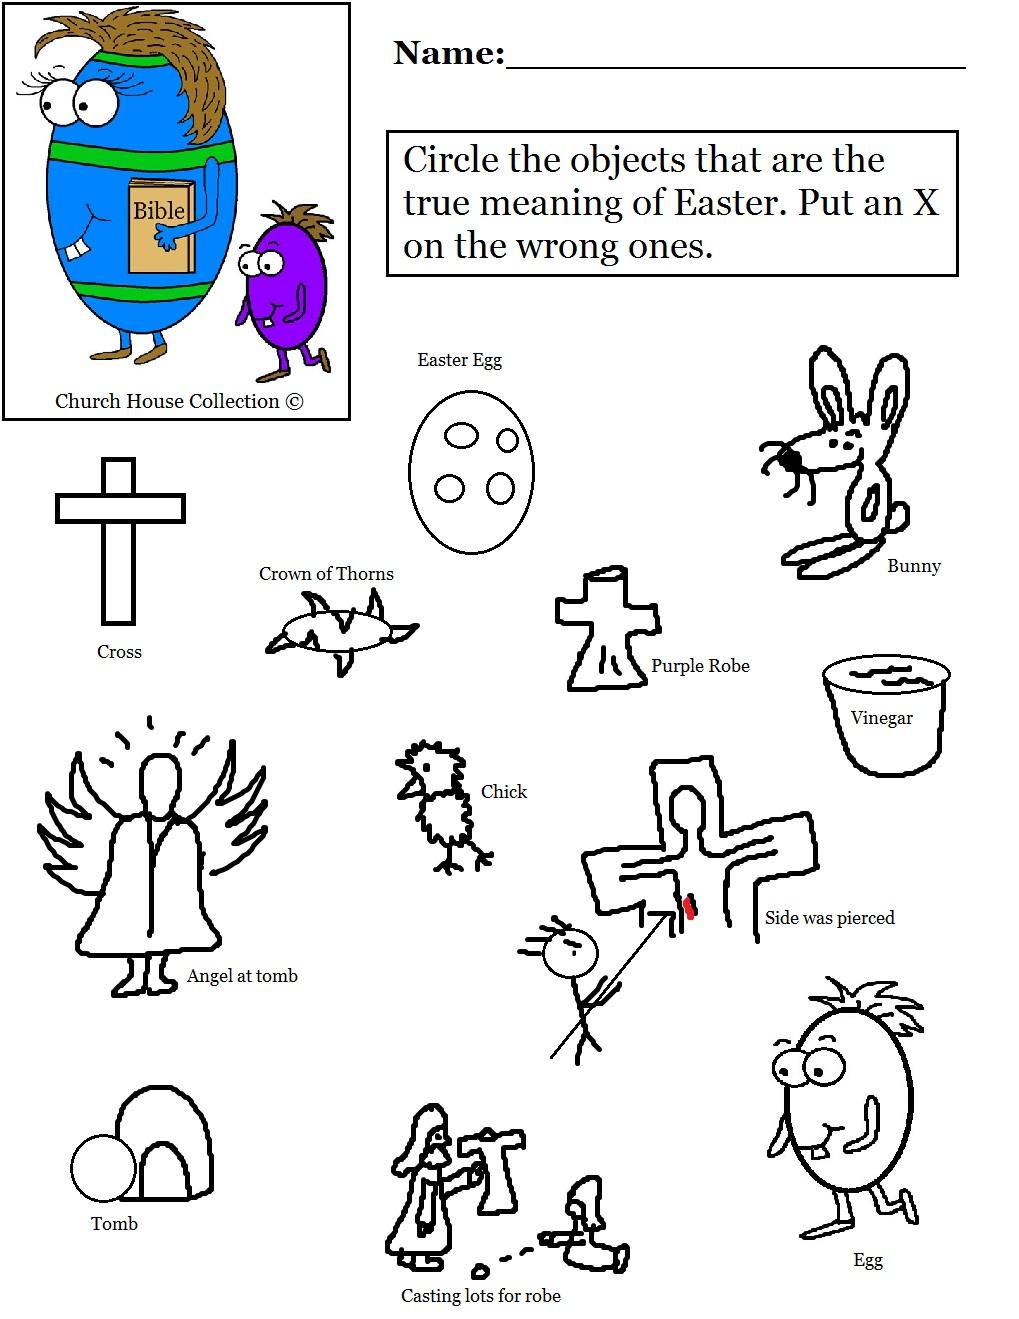 Sunday School Worksheets Free - Worksheets